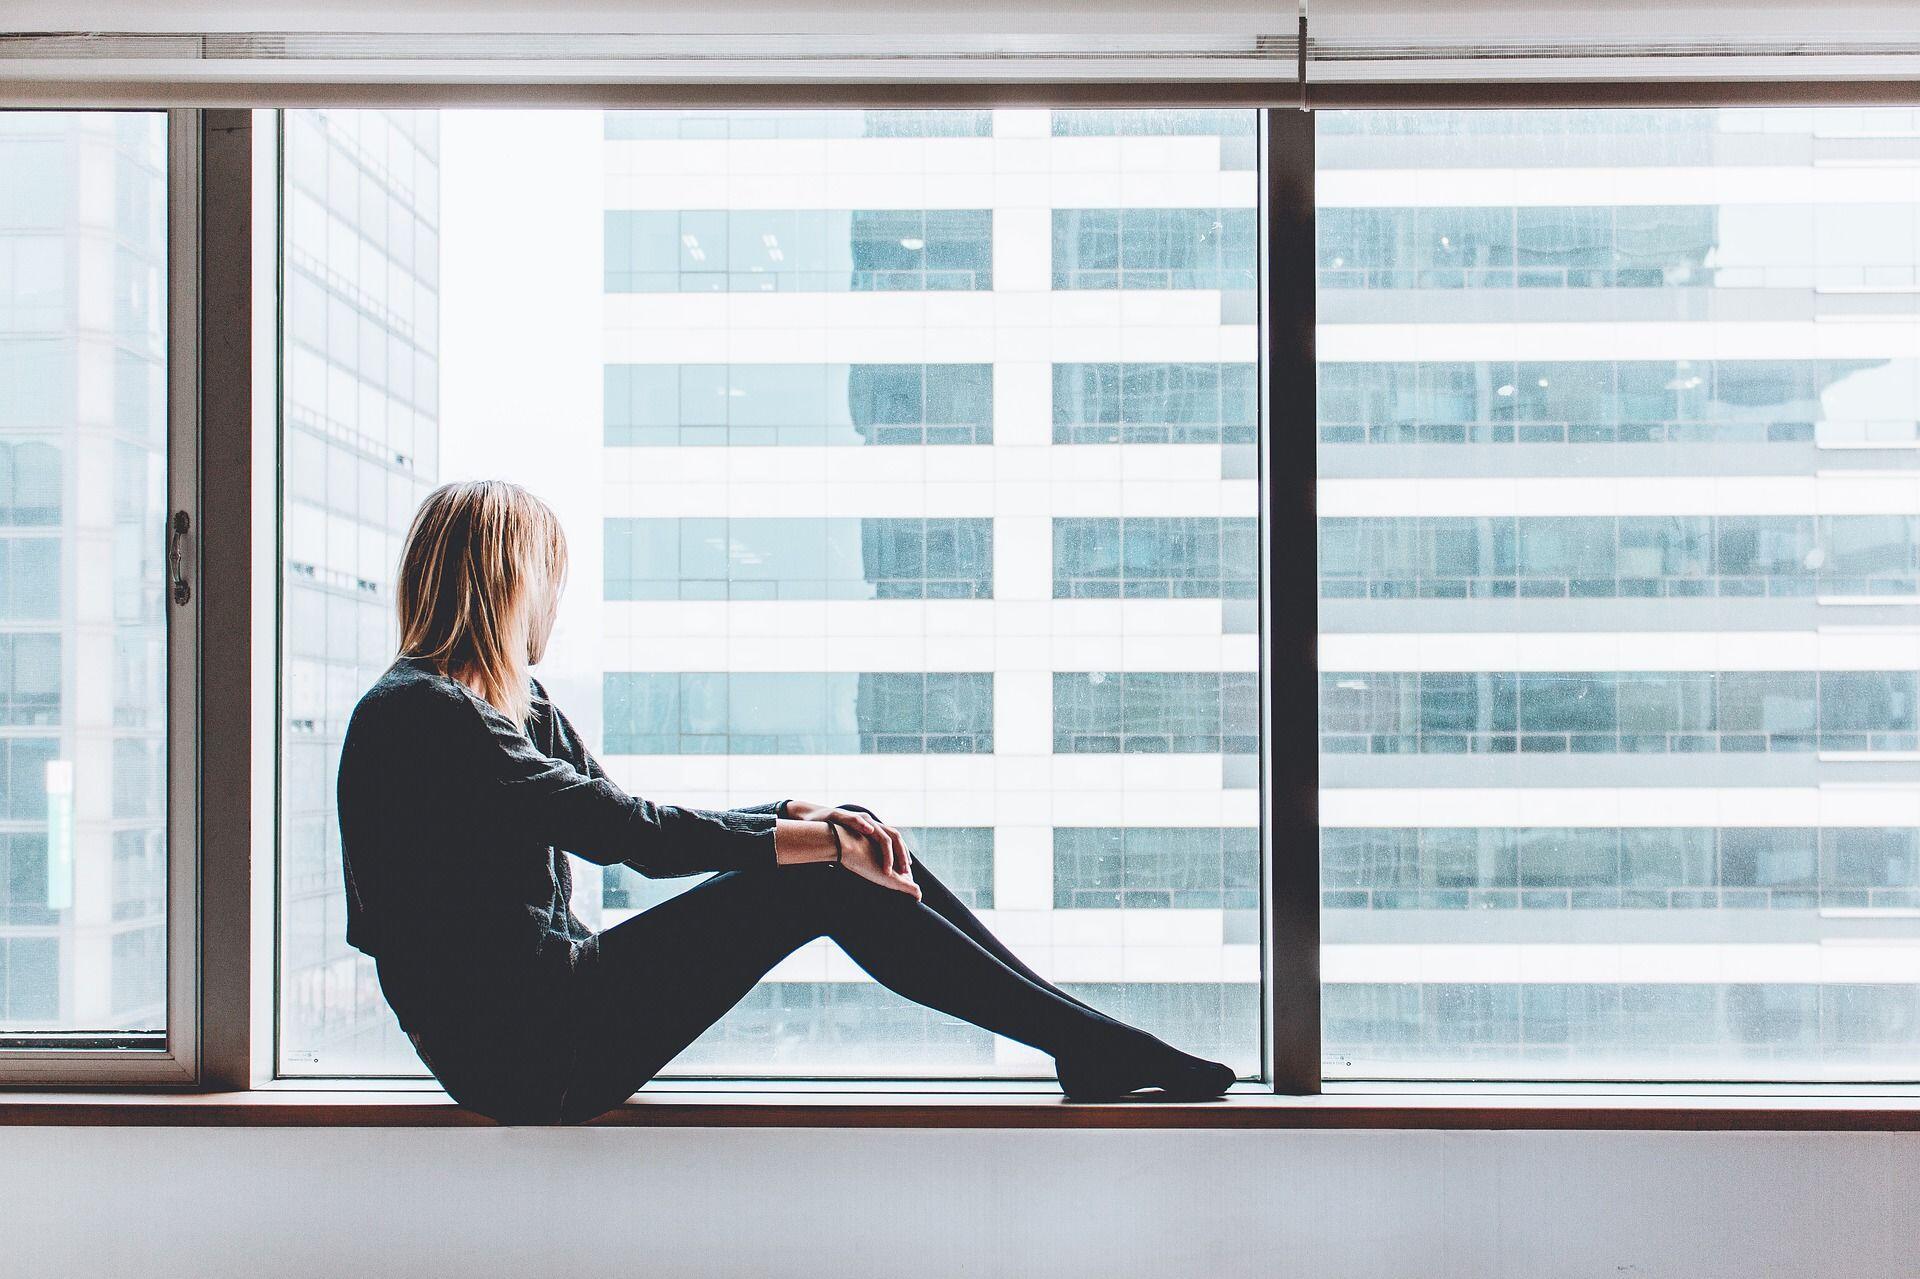 Meski Aktif, 7 Kebiasaan Ini Membuat Hidupmu Masih Monoton!